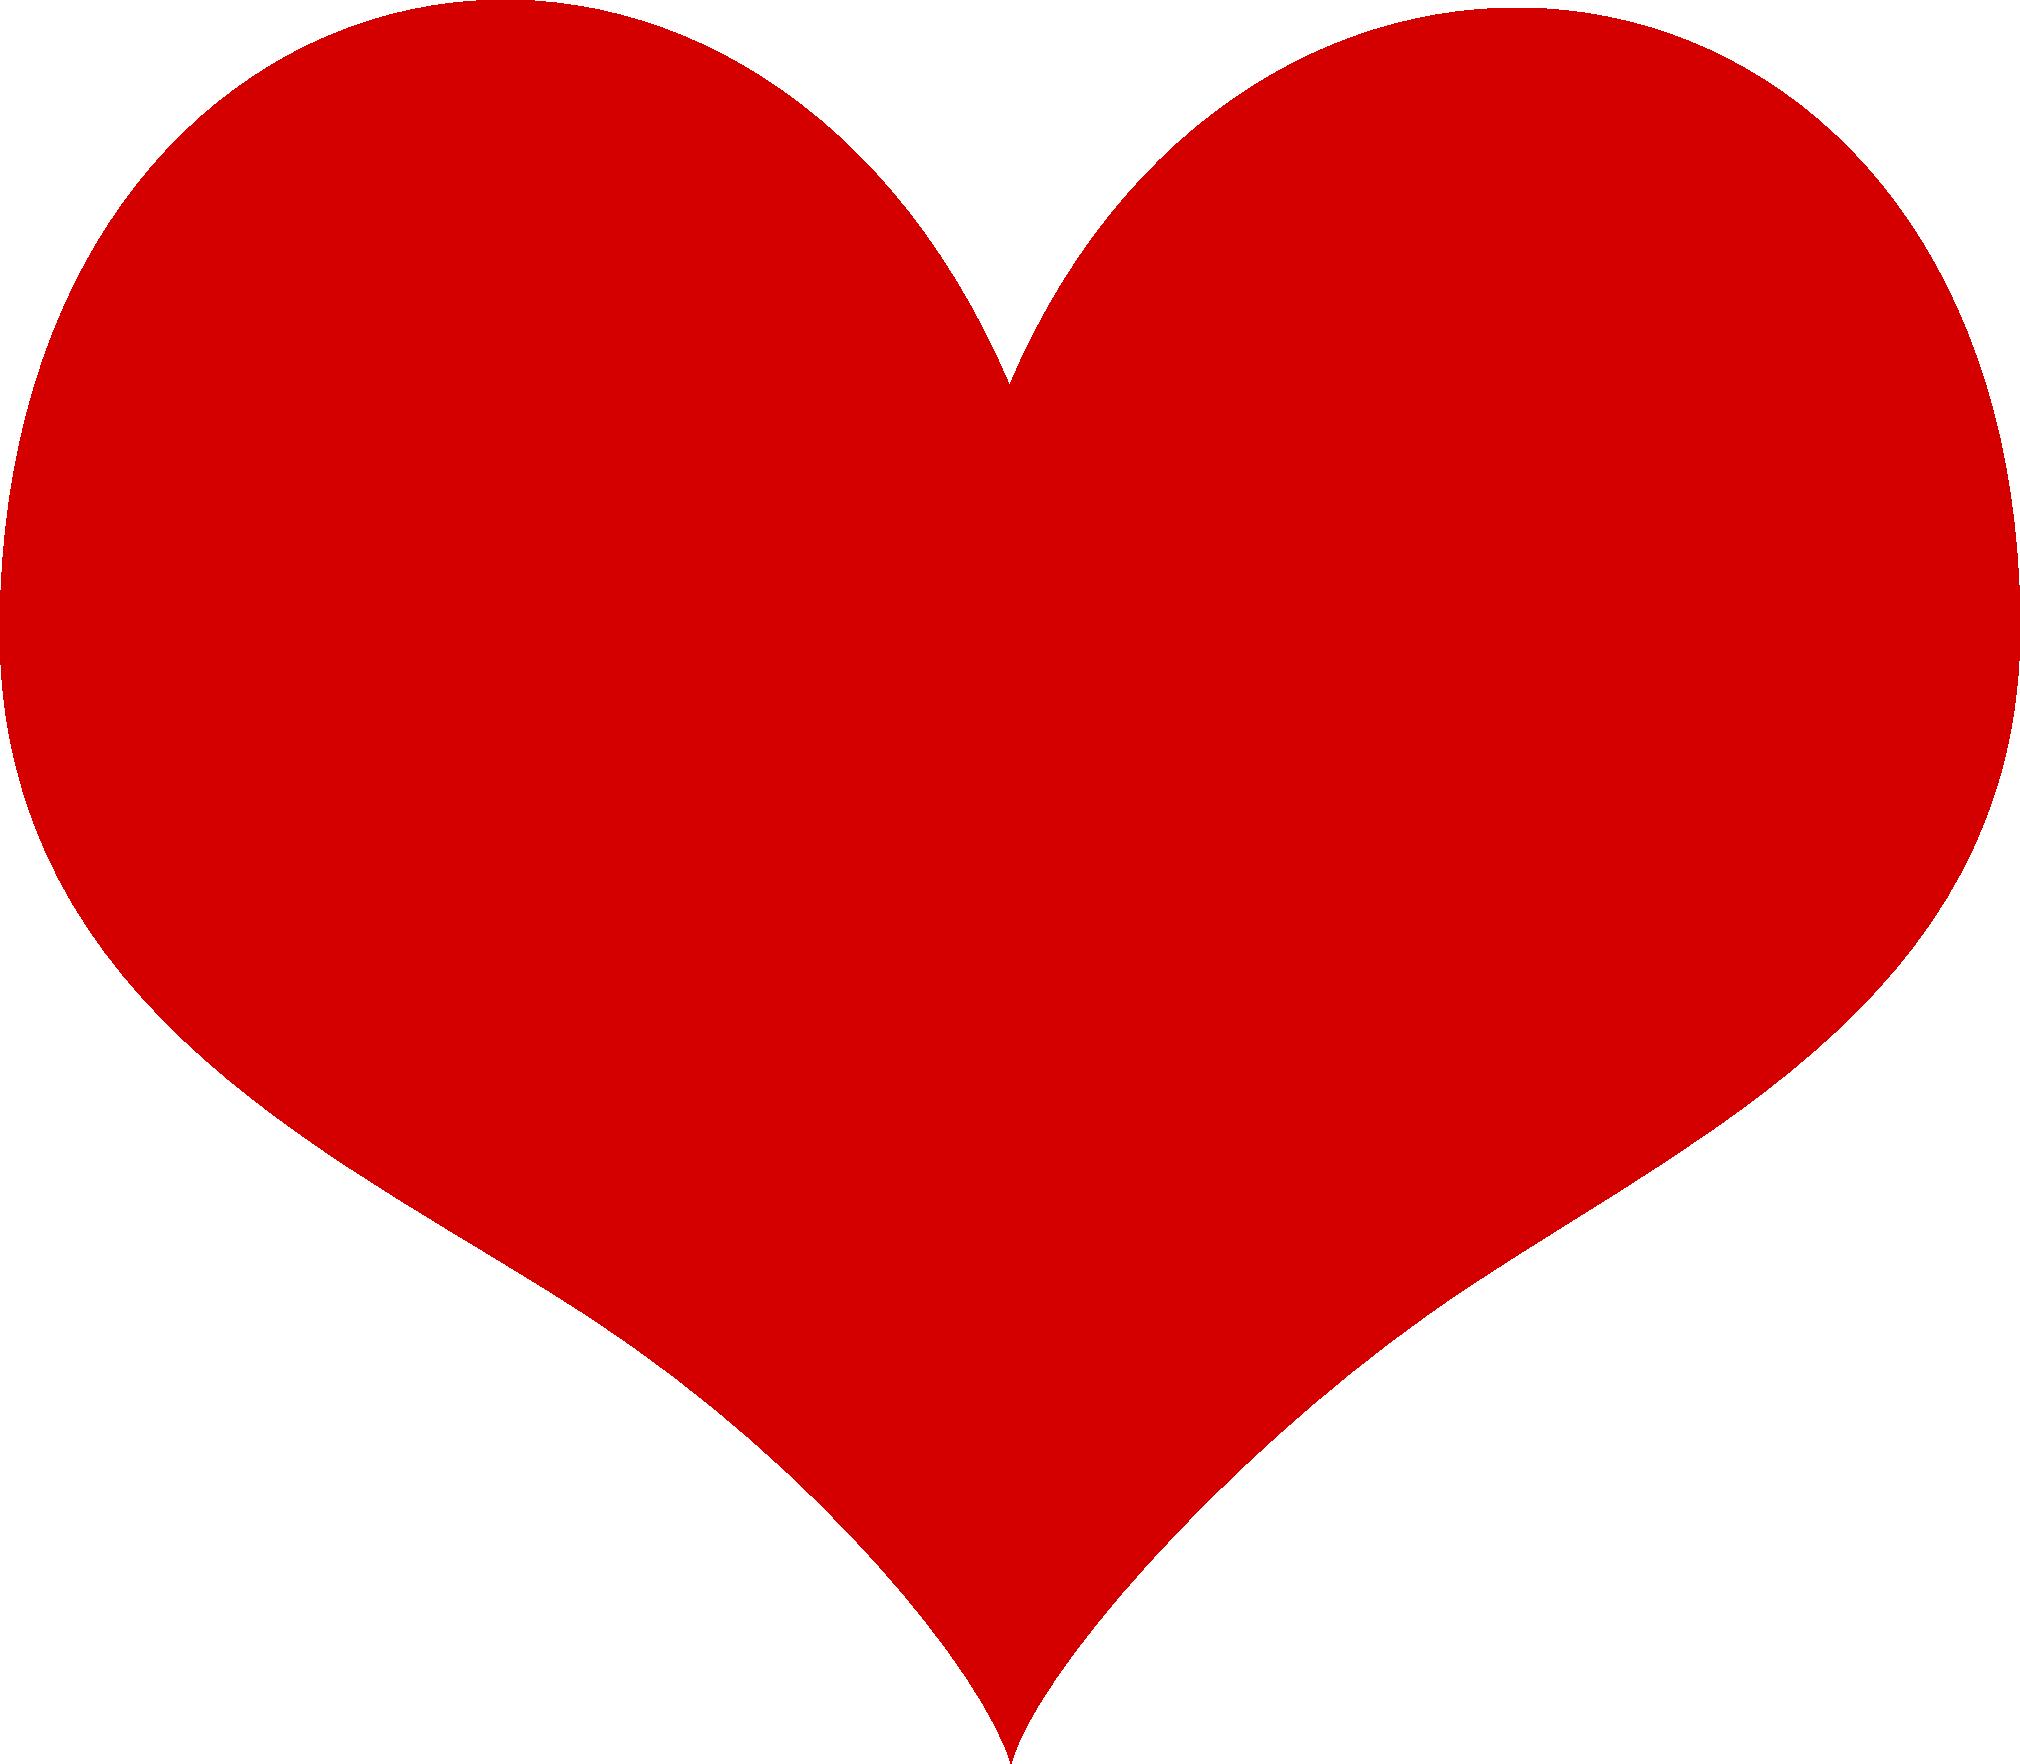 Cardiac Heart Clip Art.